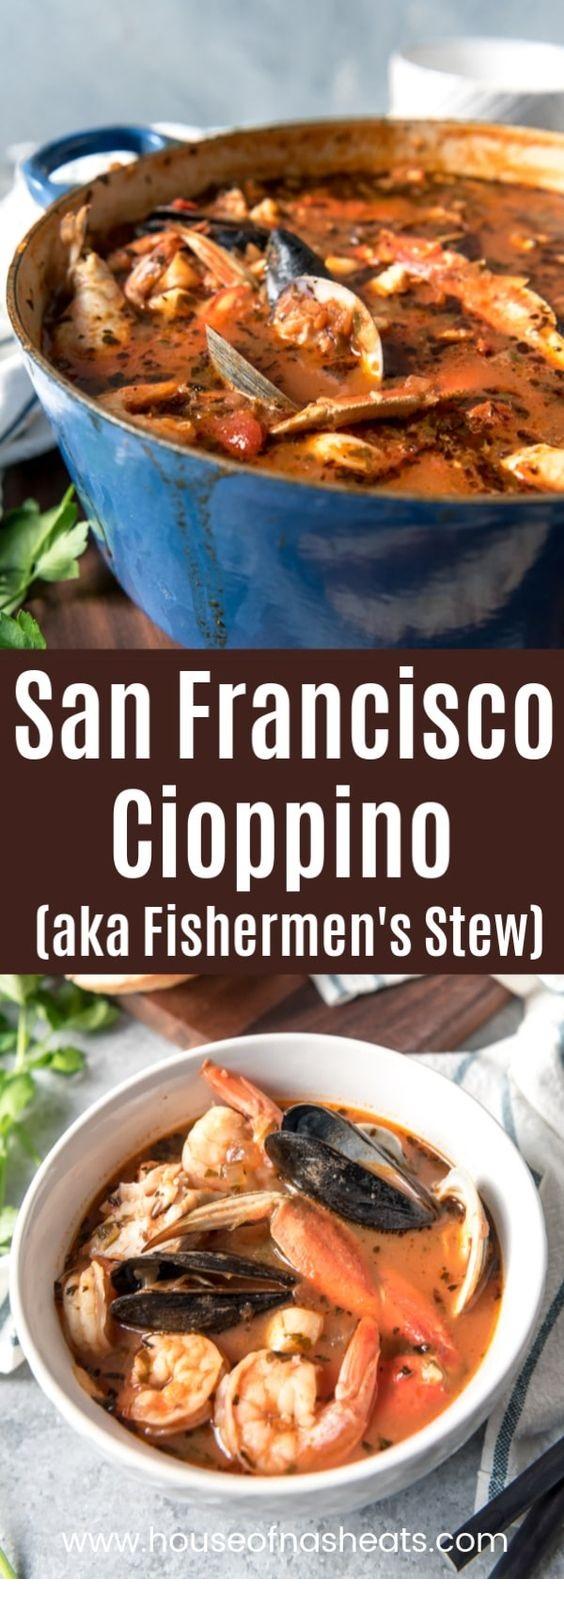 San Francisco Cioppino